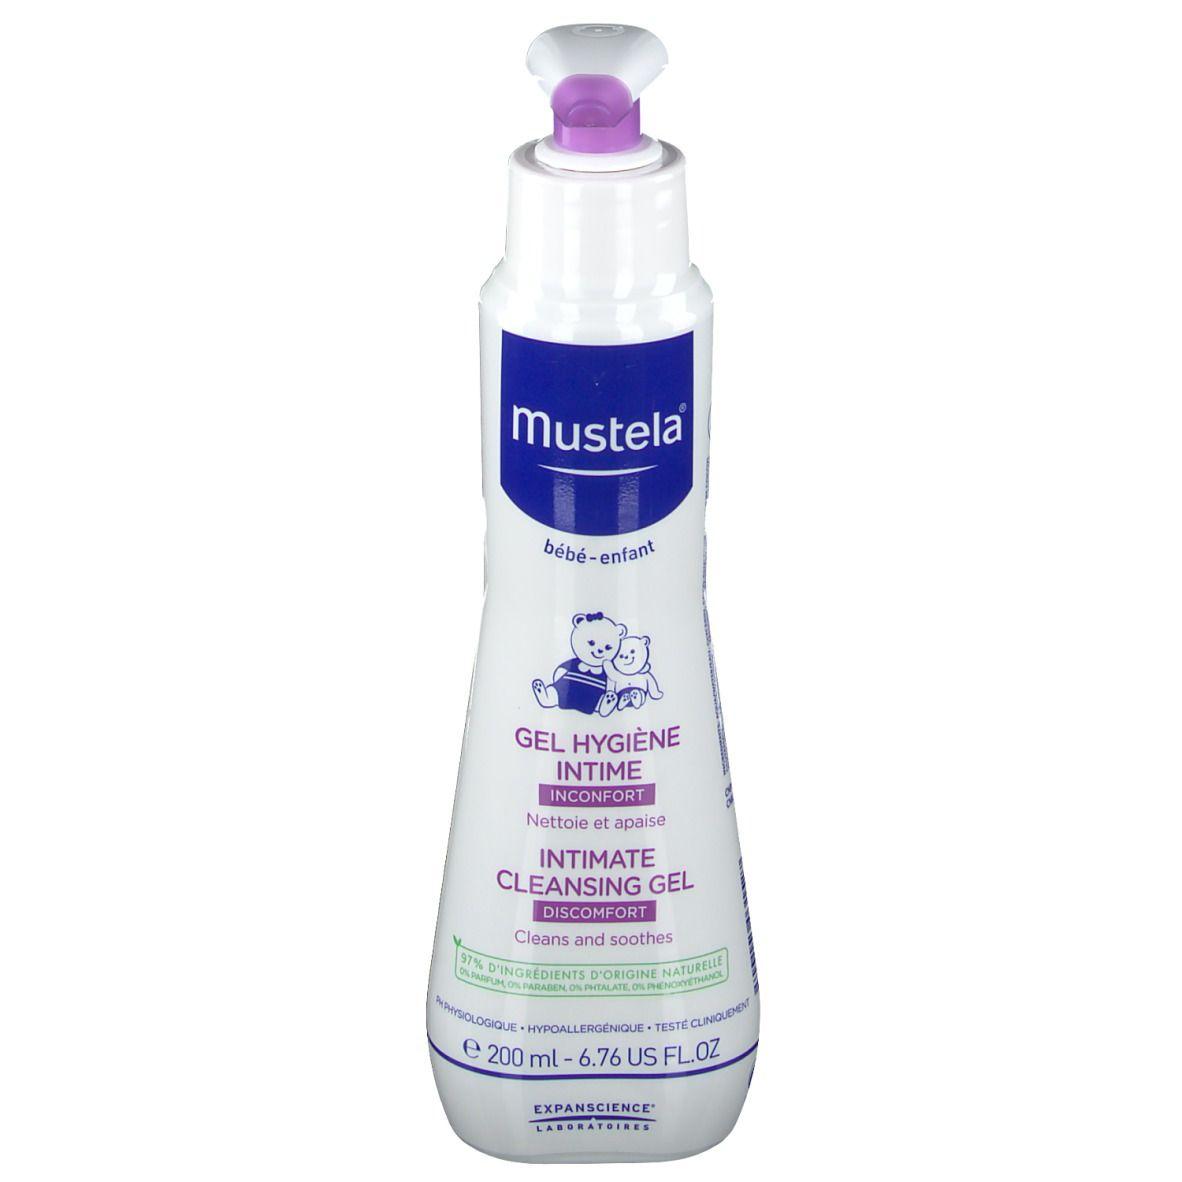 mustela® Gel hygiène intime ml gel(s)